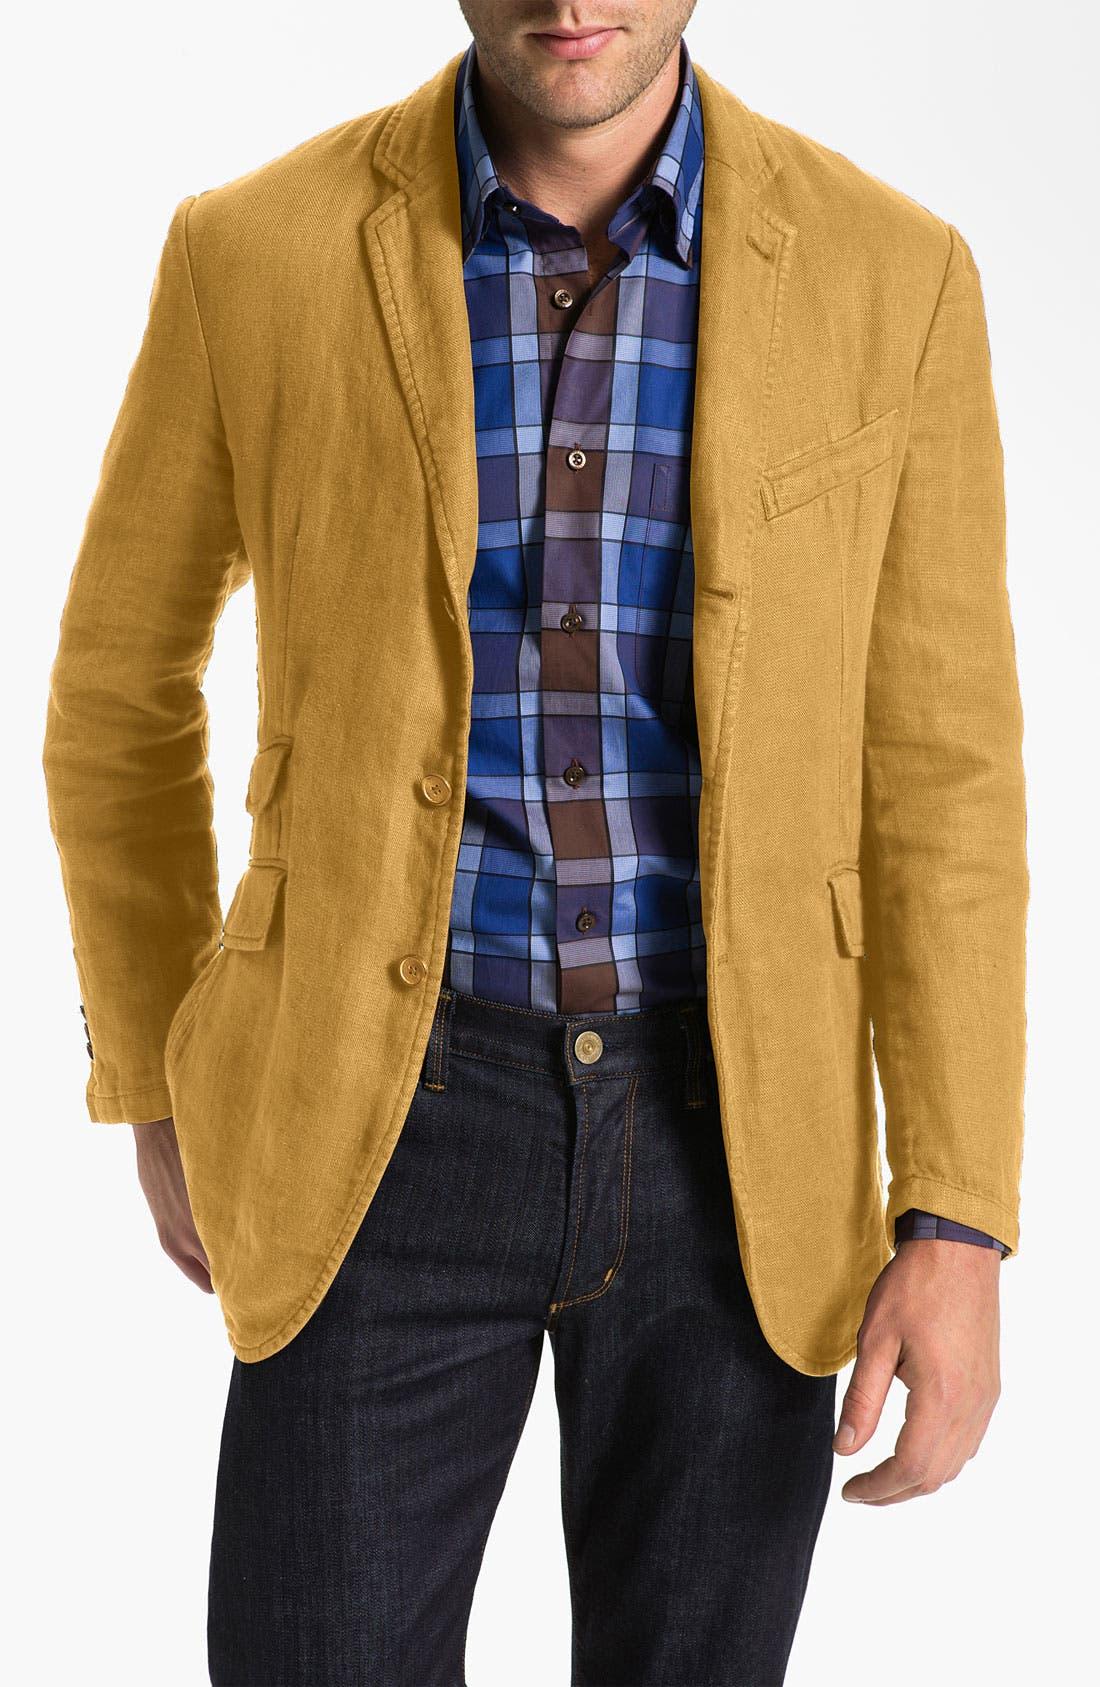 Main Image - Robert Talbott 'Ventana' Linen Sportcoat